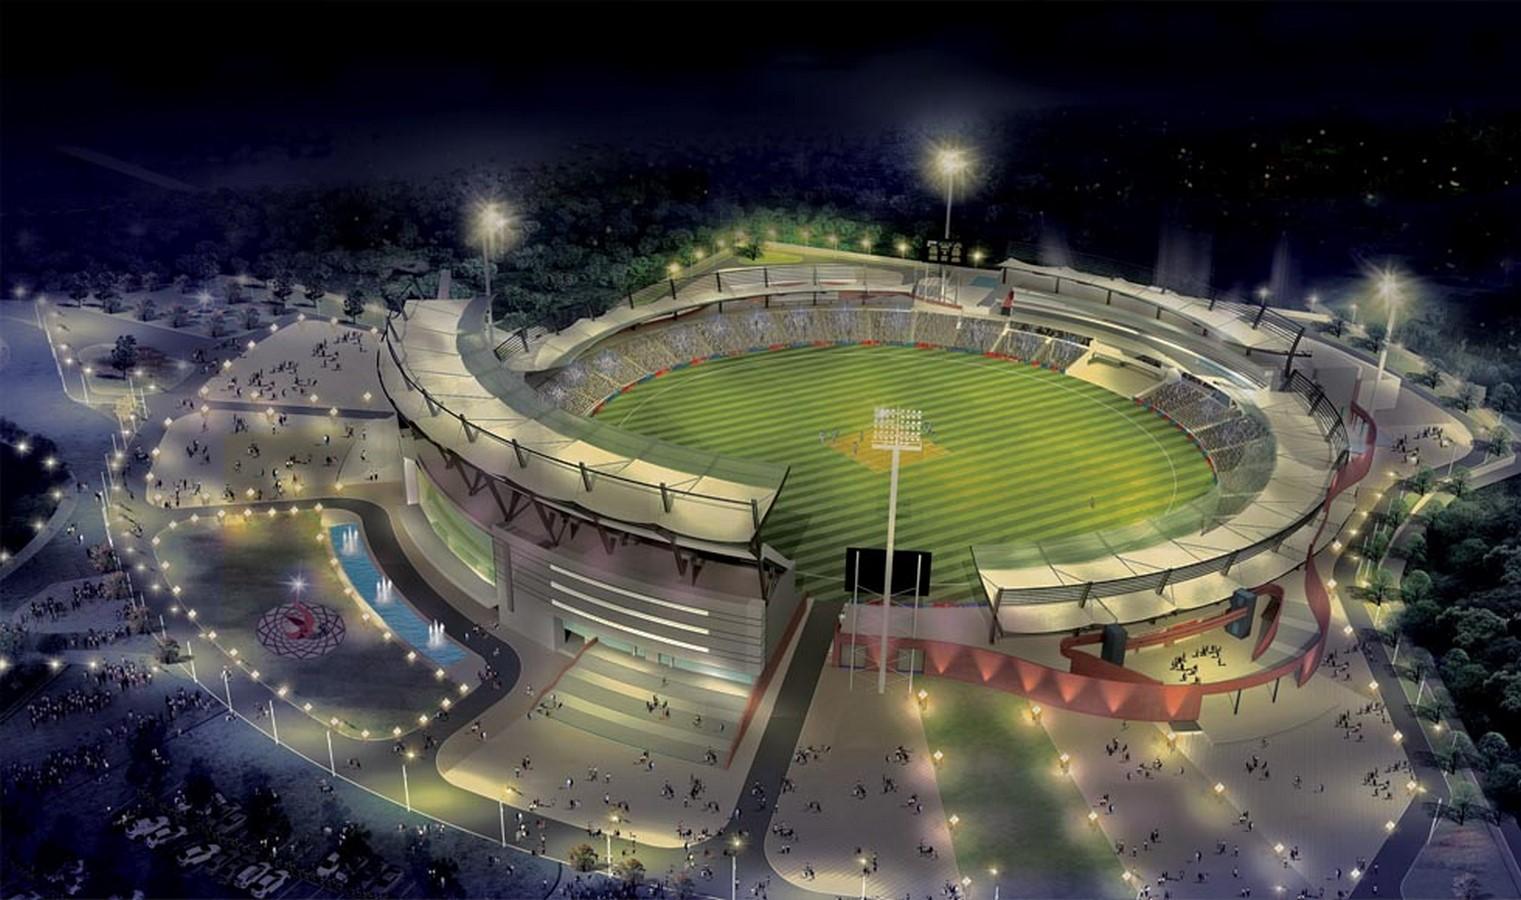 Rajiv Gandhi International Cricket Stadium by Shashi Prabhu: One of India's most popular cricket stadiums - Sheet1